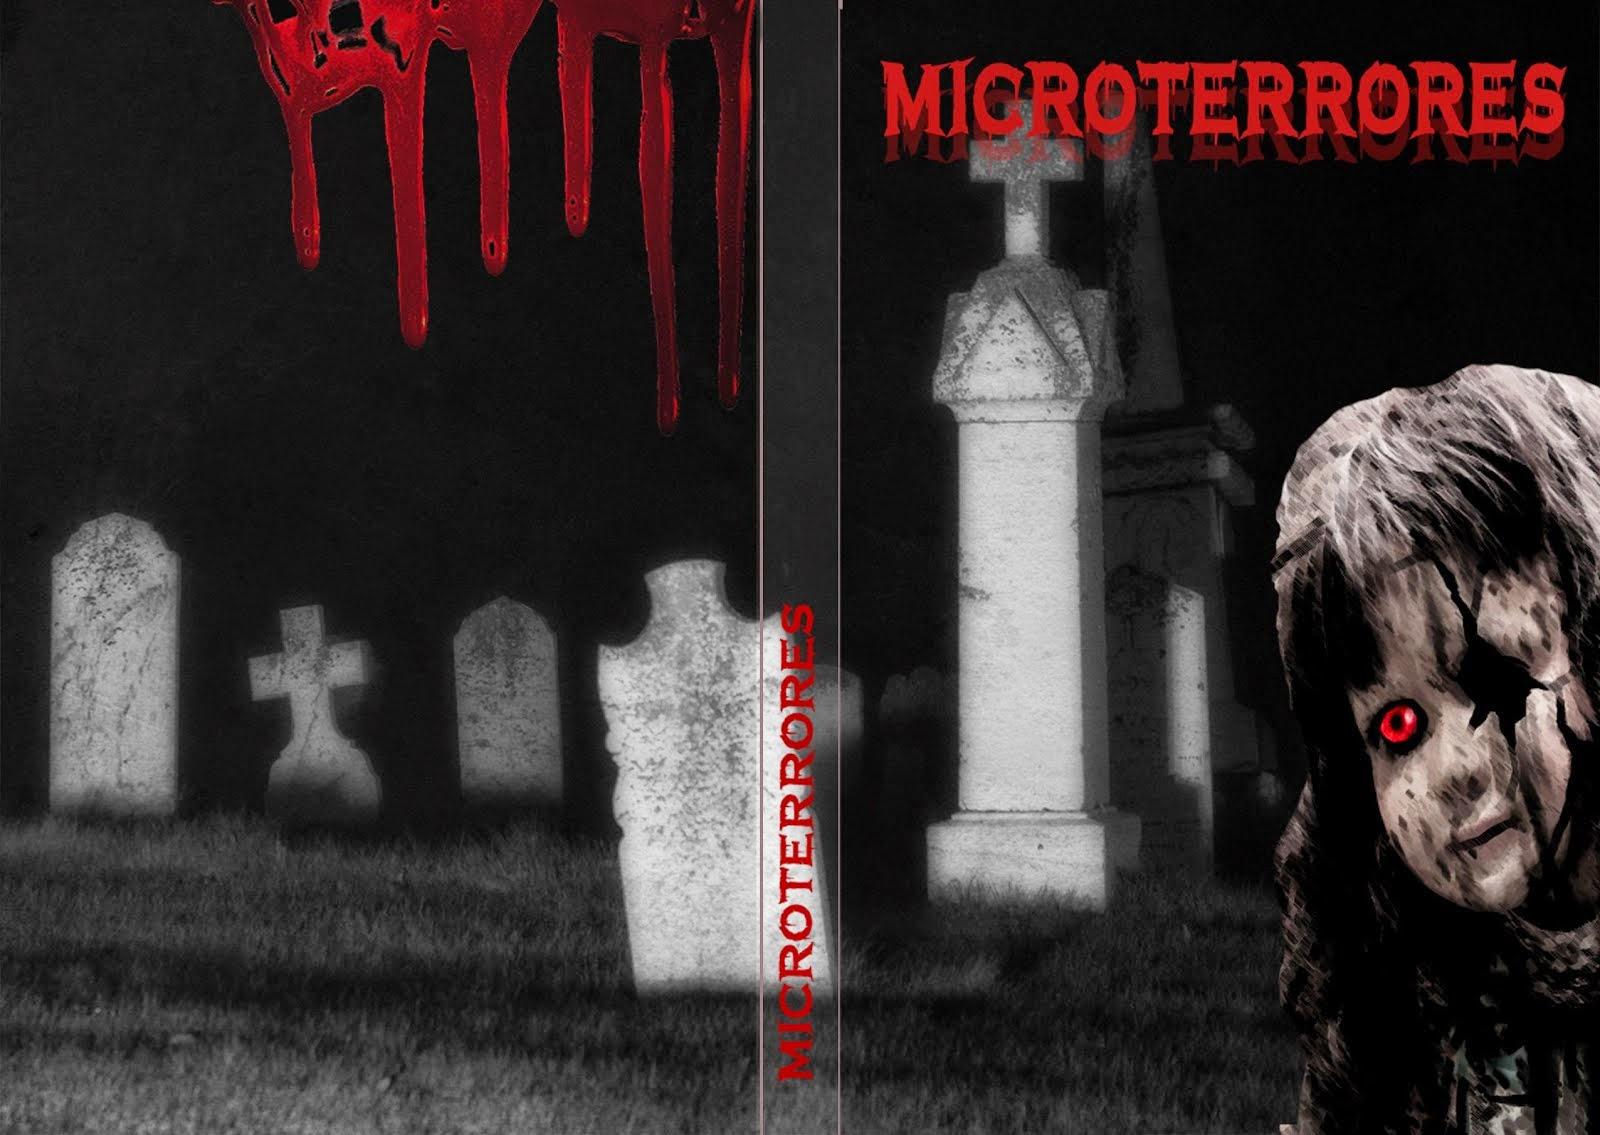 ANTOLOGÍA VV.AA: MICROTERRORES http://www.diversidadliteraria.com/